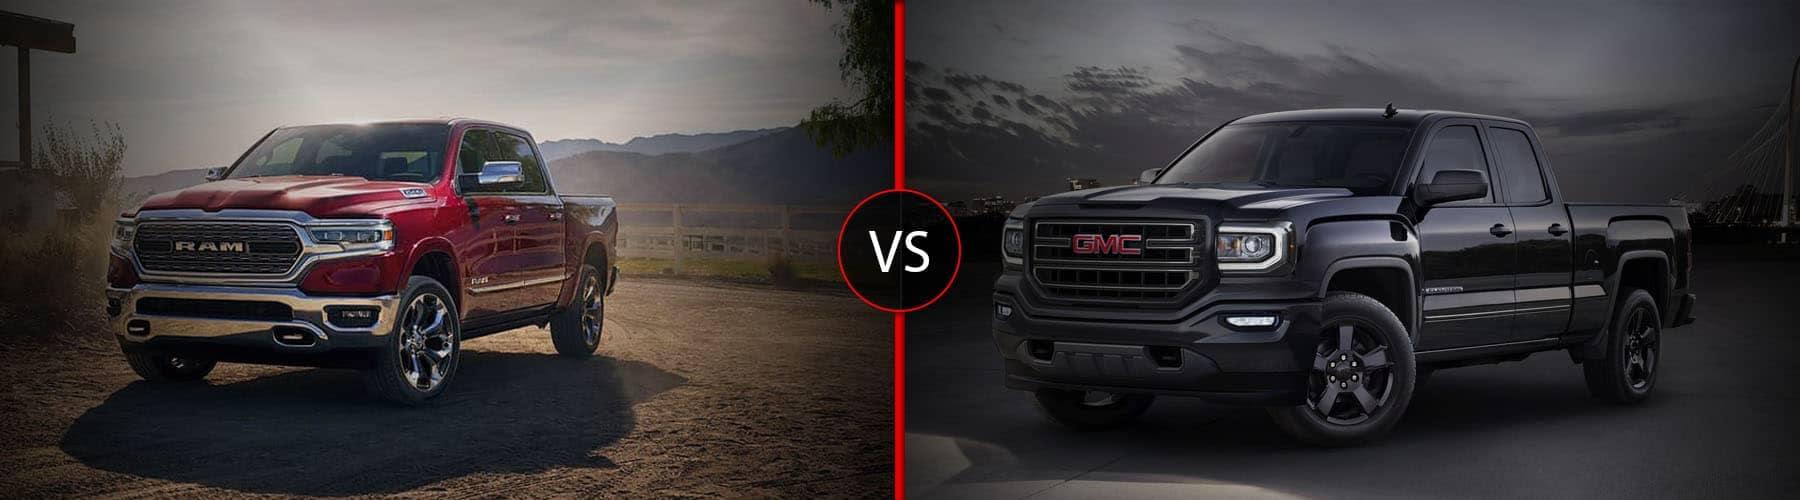 Ram 1500 vs GMC Sierra 1500